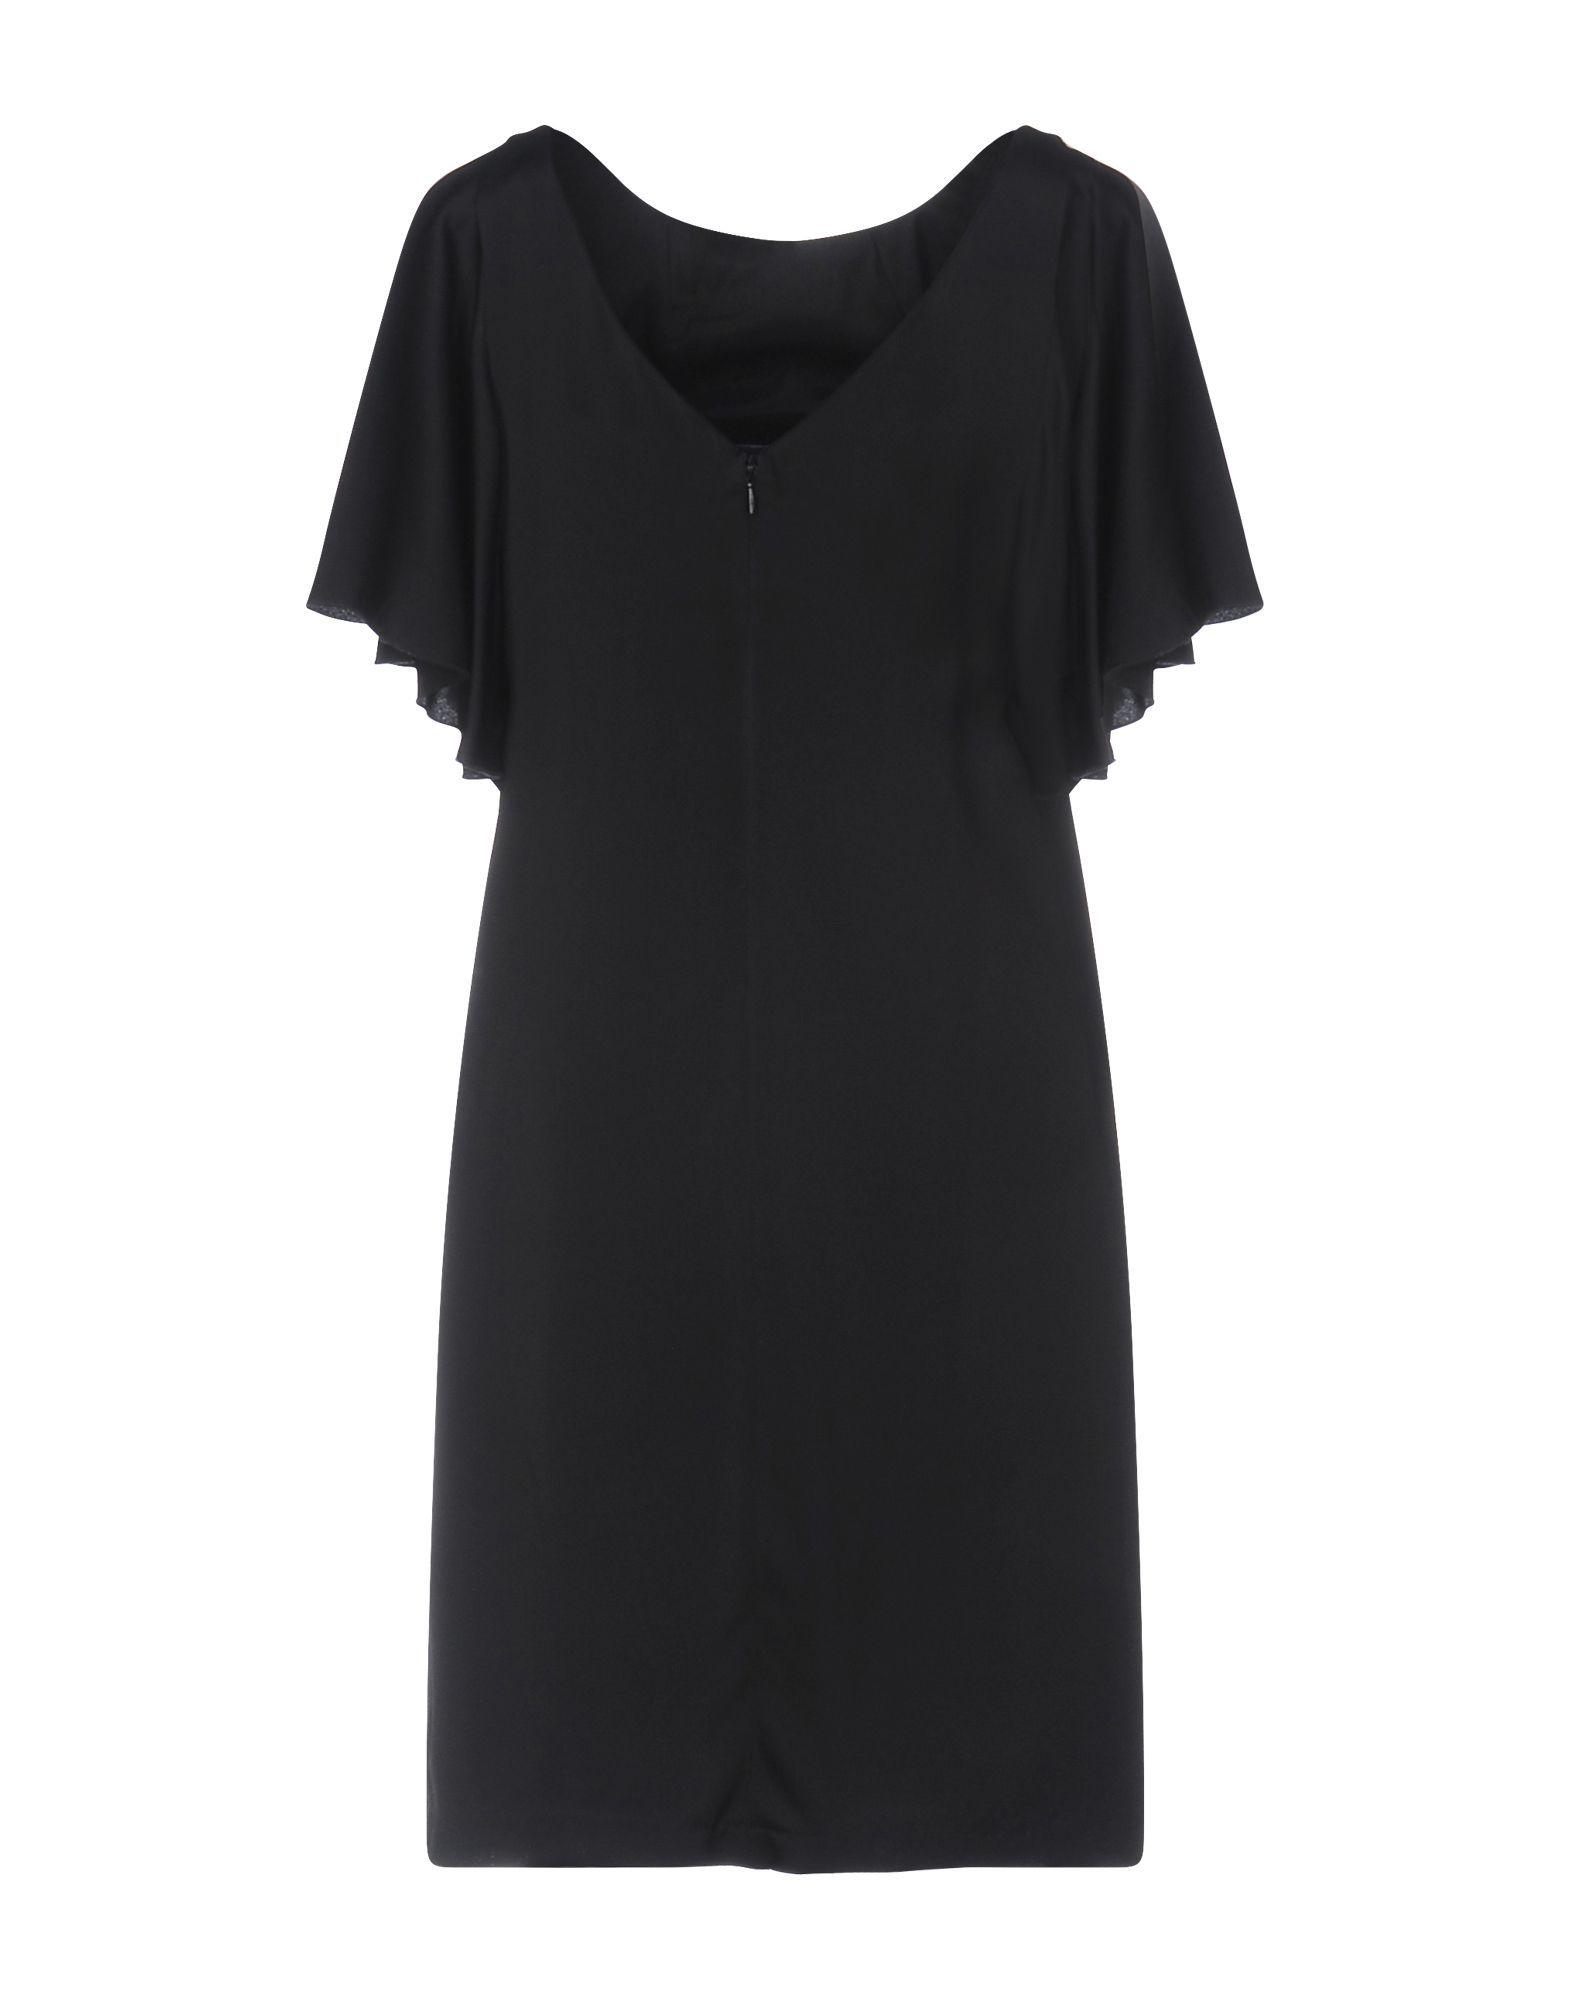 Manila Grace Black Crepe Short Sleeve Dress